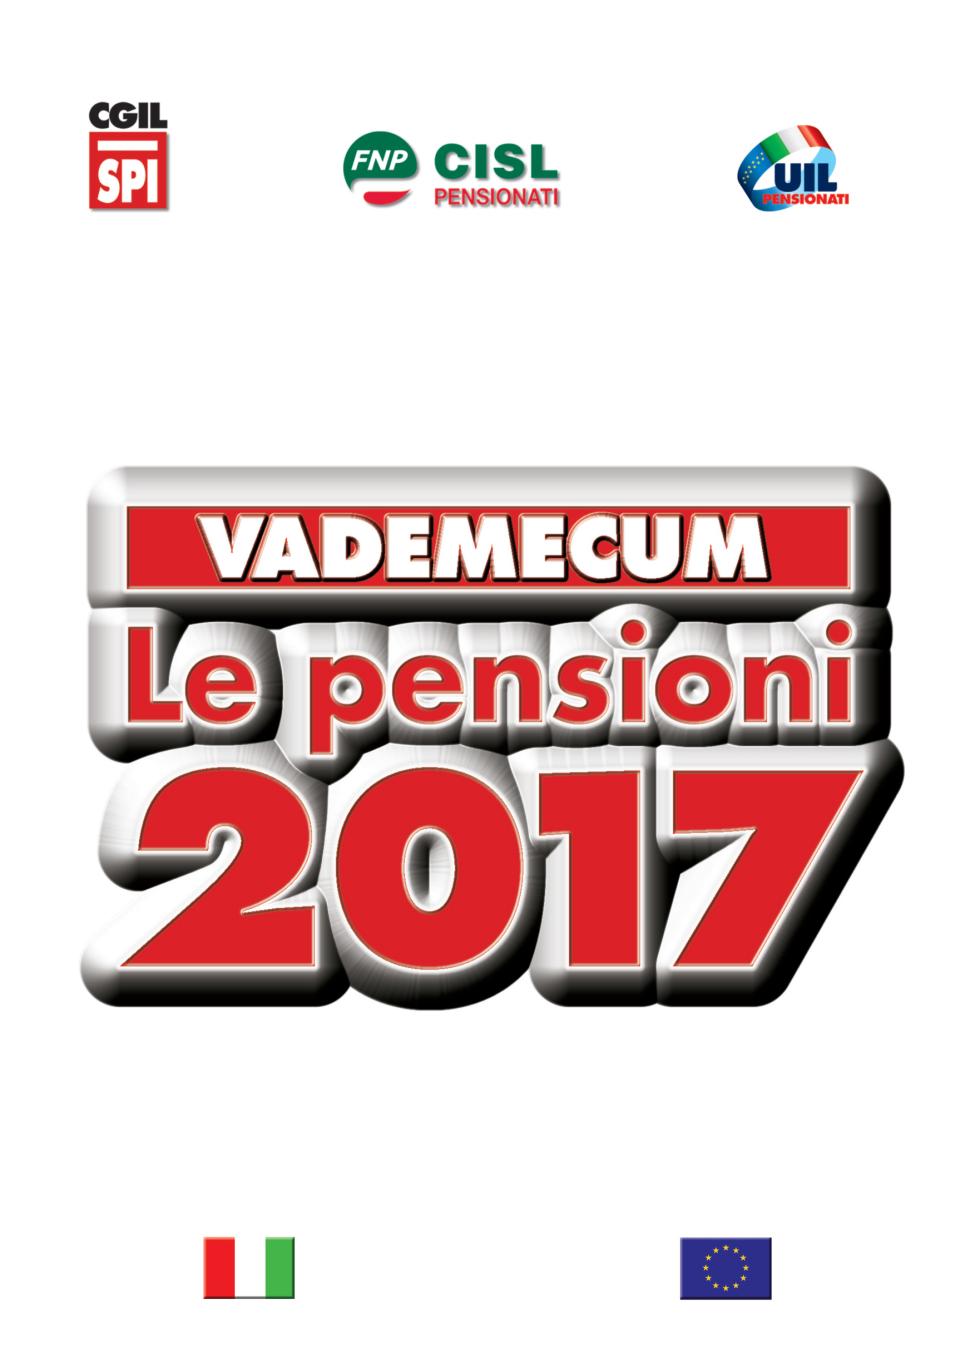 Il nuovo Vademecum sulle pensioni